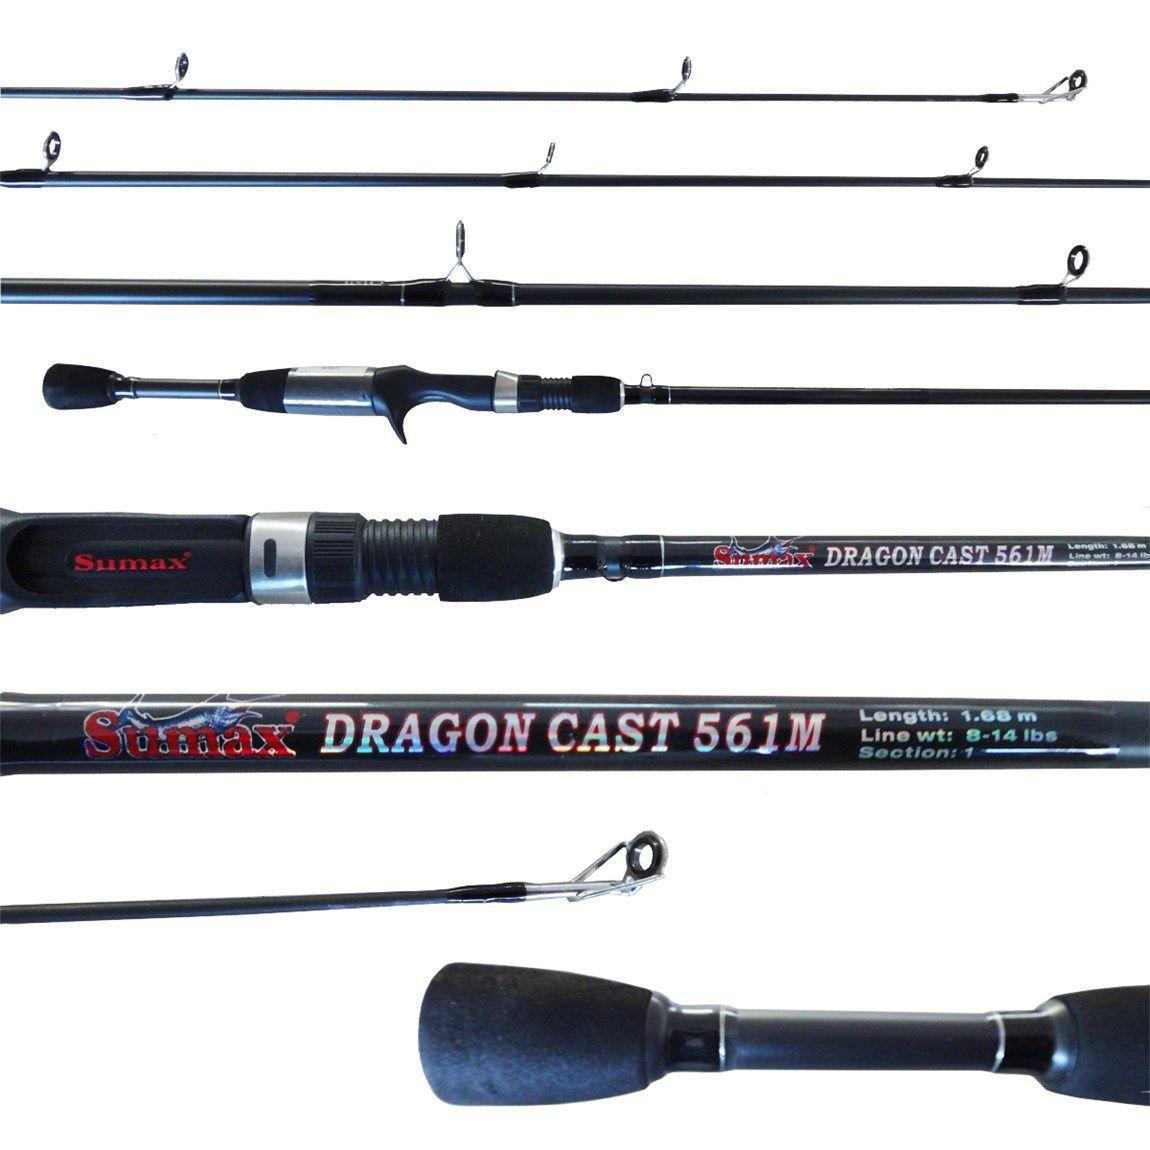 Vara Sumax Dragon Cast 561m (1,68m) 14lb Carretilha Inteiriça  - Pesca Adventure